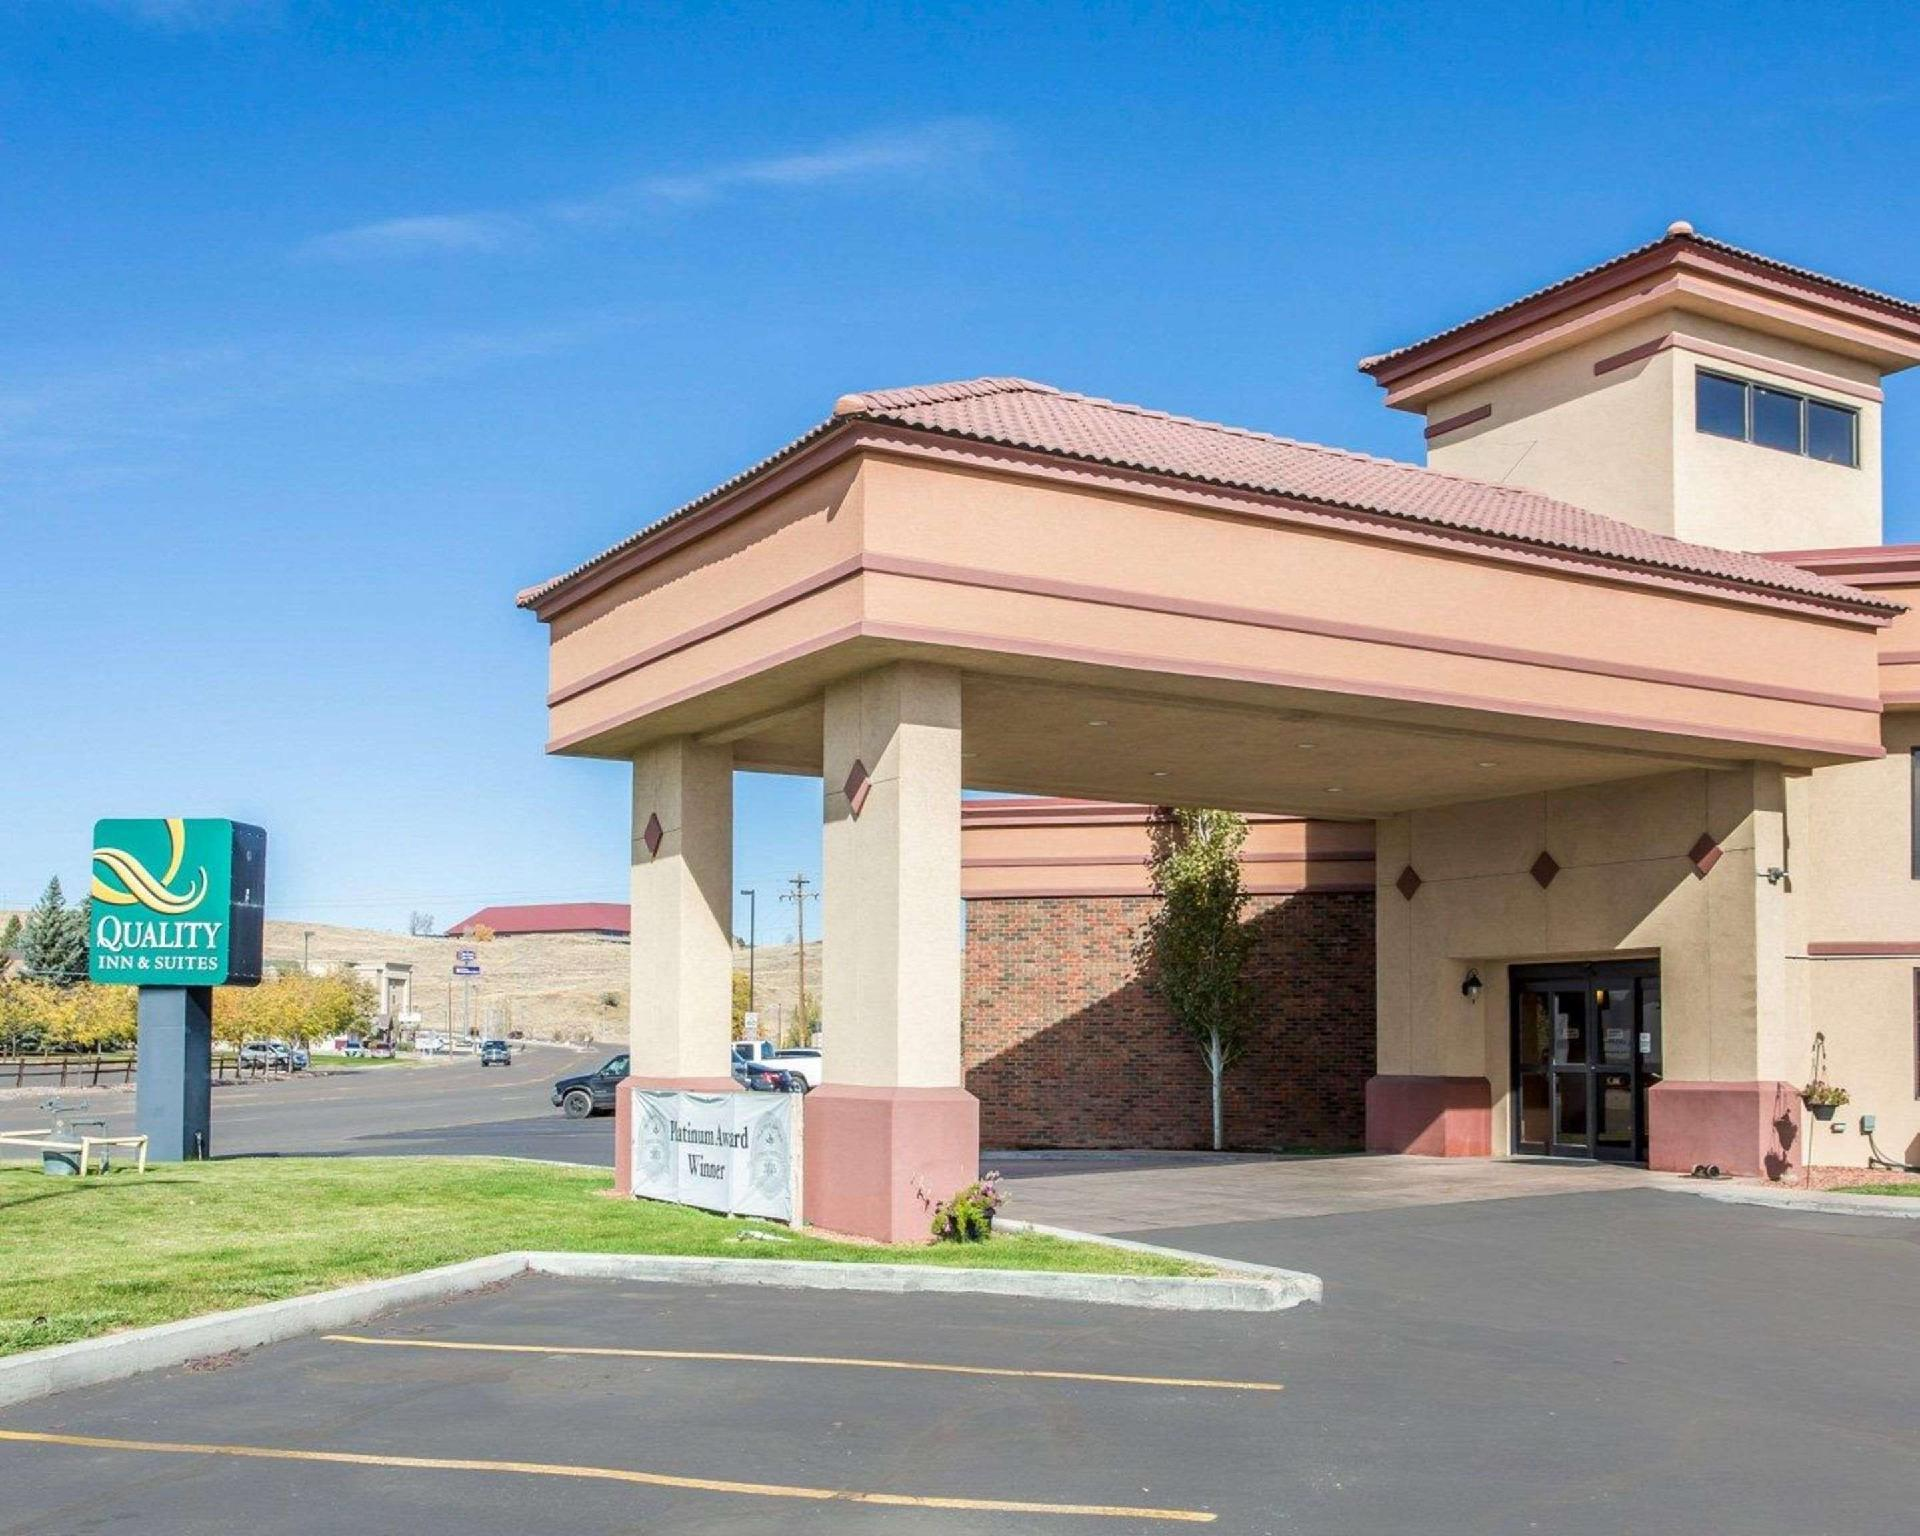 Quality Inn & Suites Casper near Event Center image